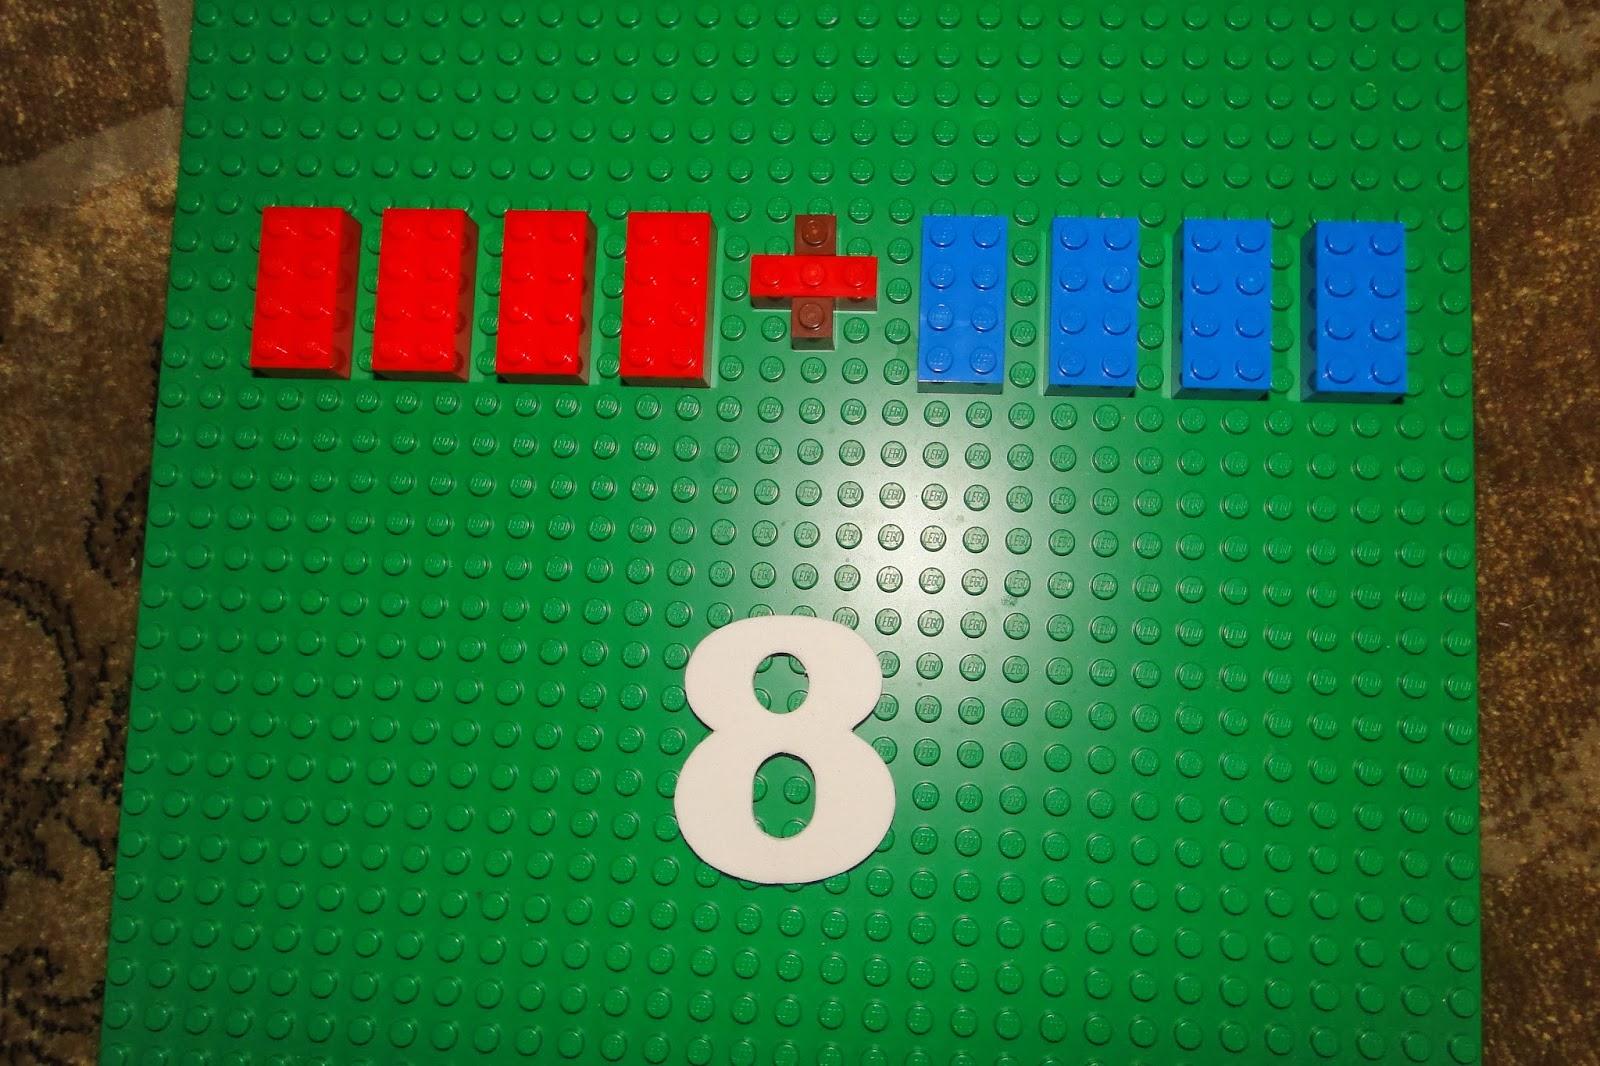 lego e matemática